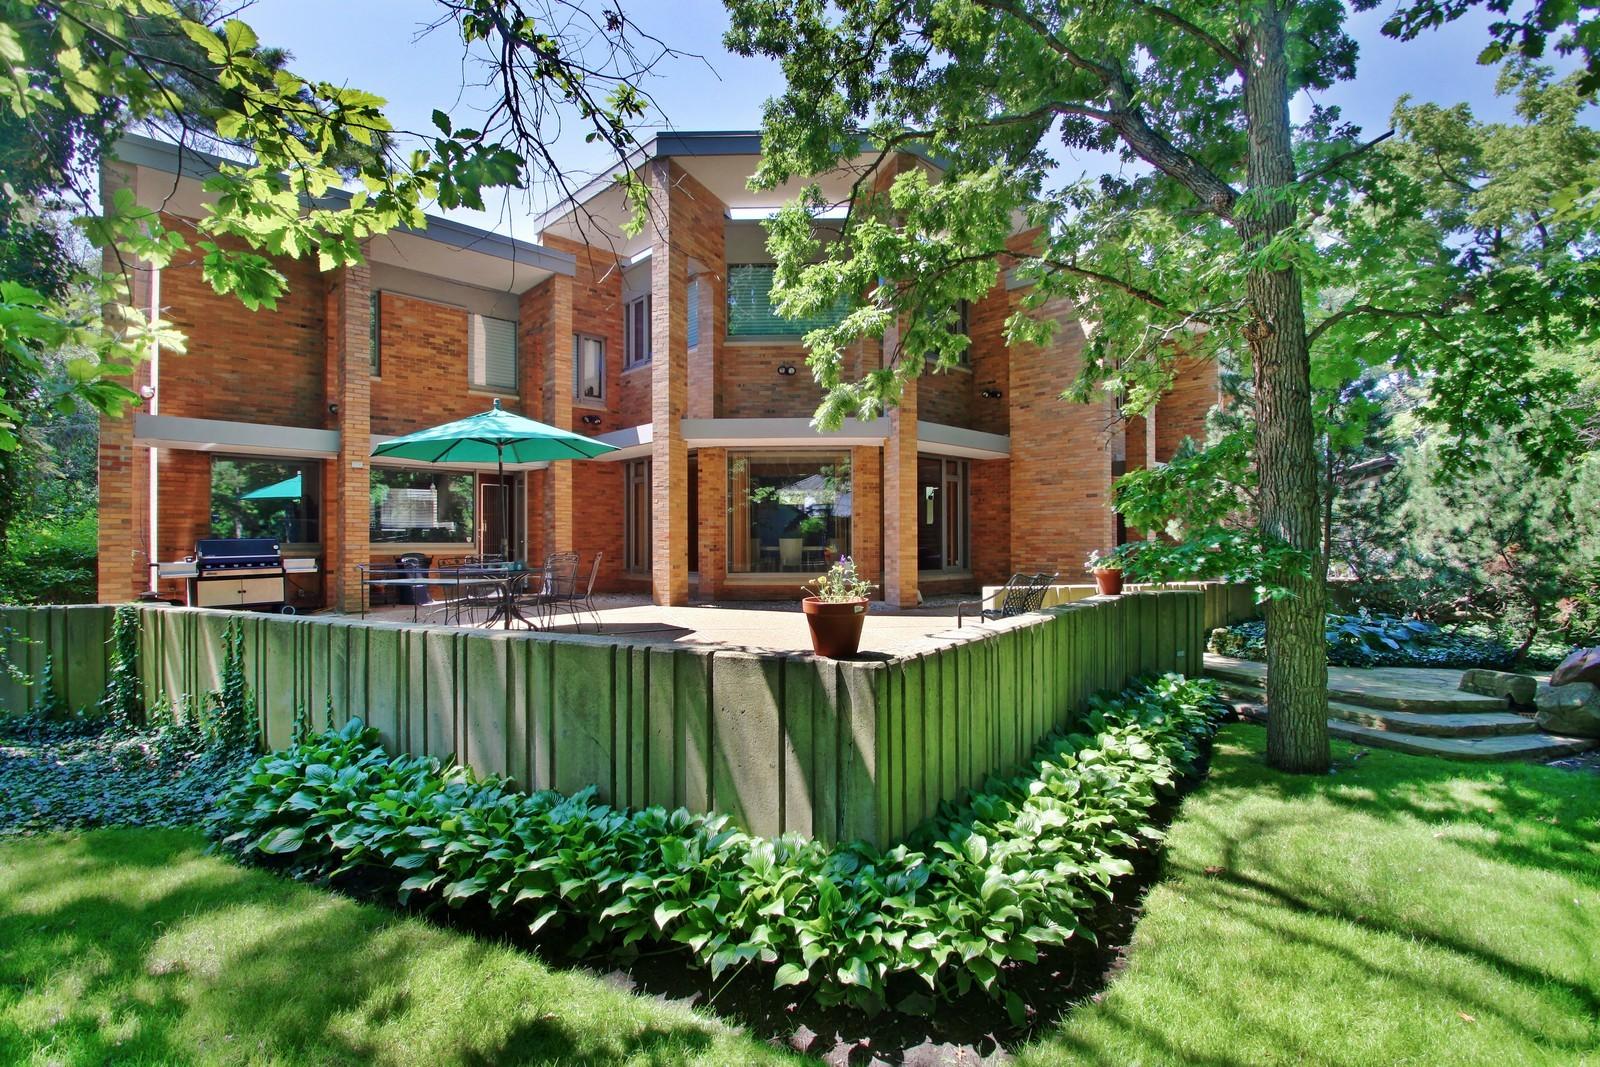 Real Estate Photography - 350 Sunrise Circle, Glencoe, IL, 60022 - Back of Home + terrace